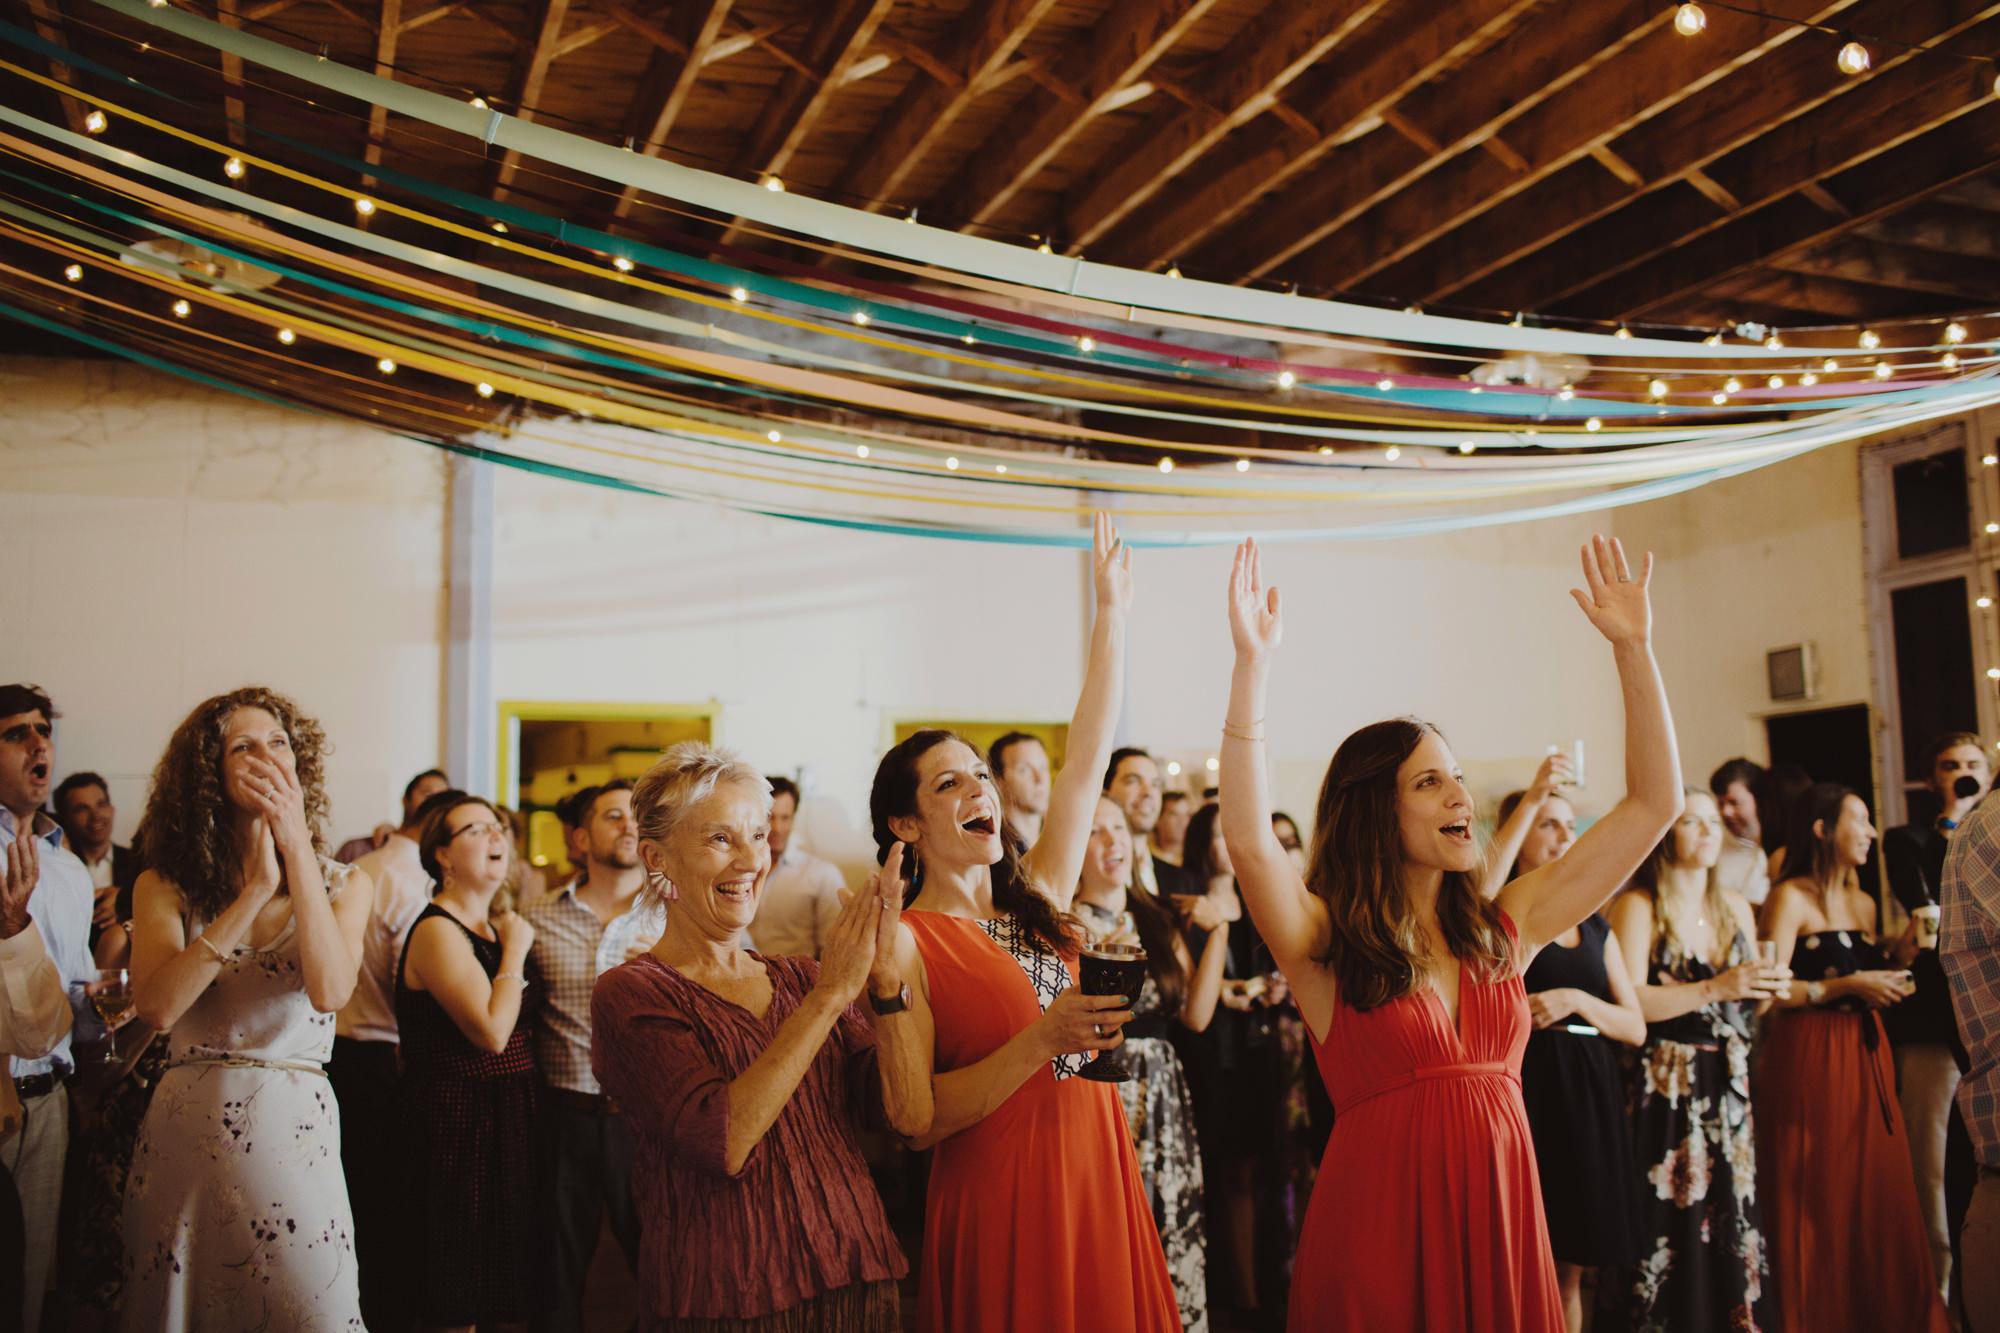 catskills_big_indian_springs_upstate_NY_wedding_sammblake138.jpg